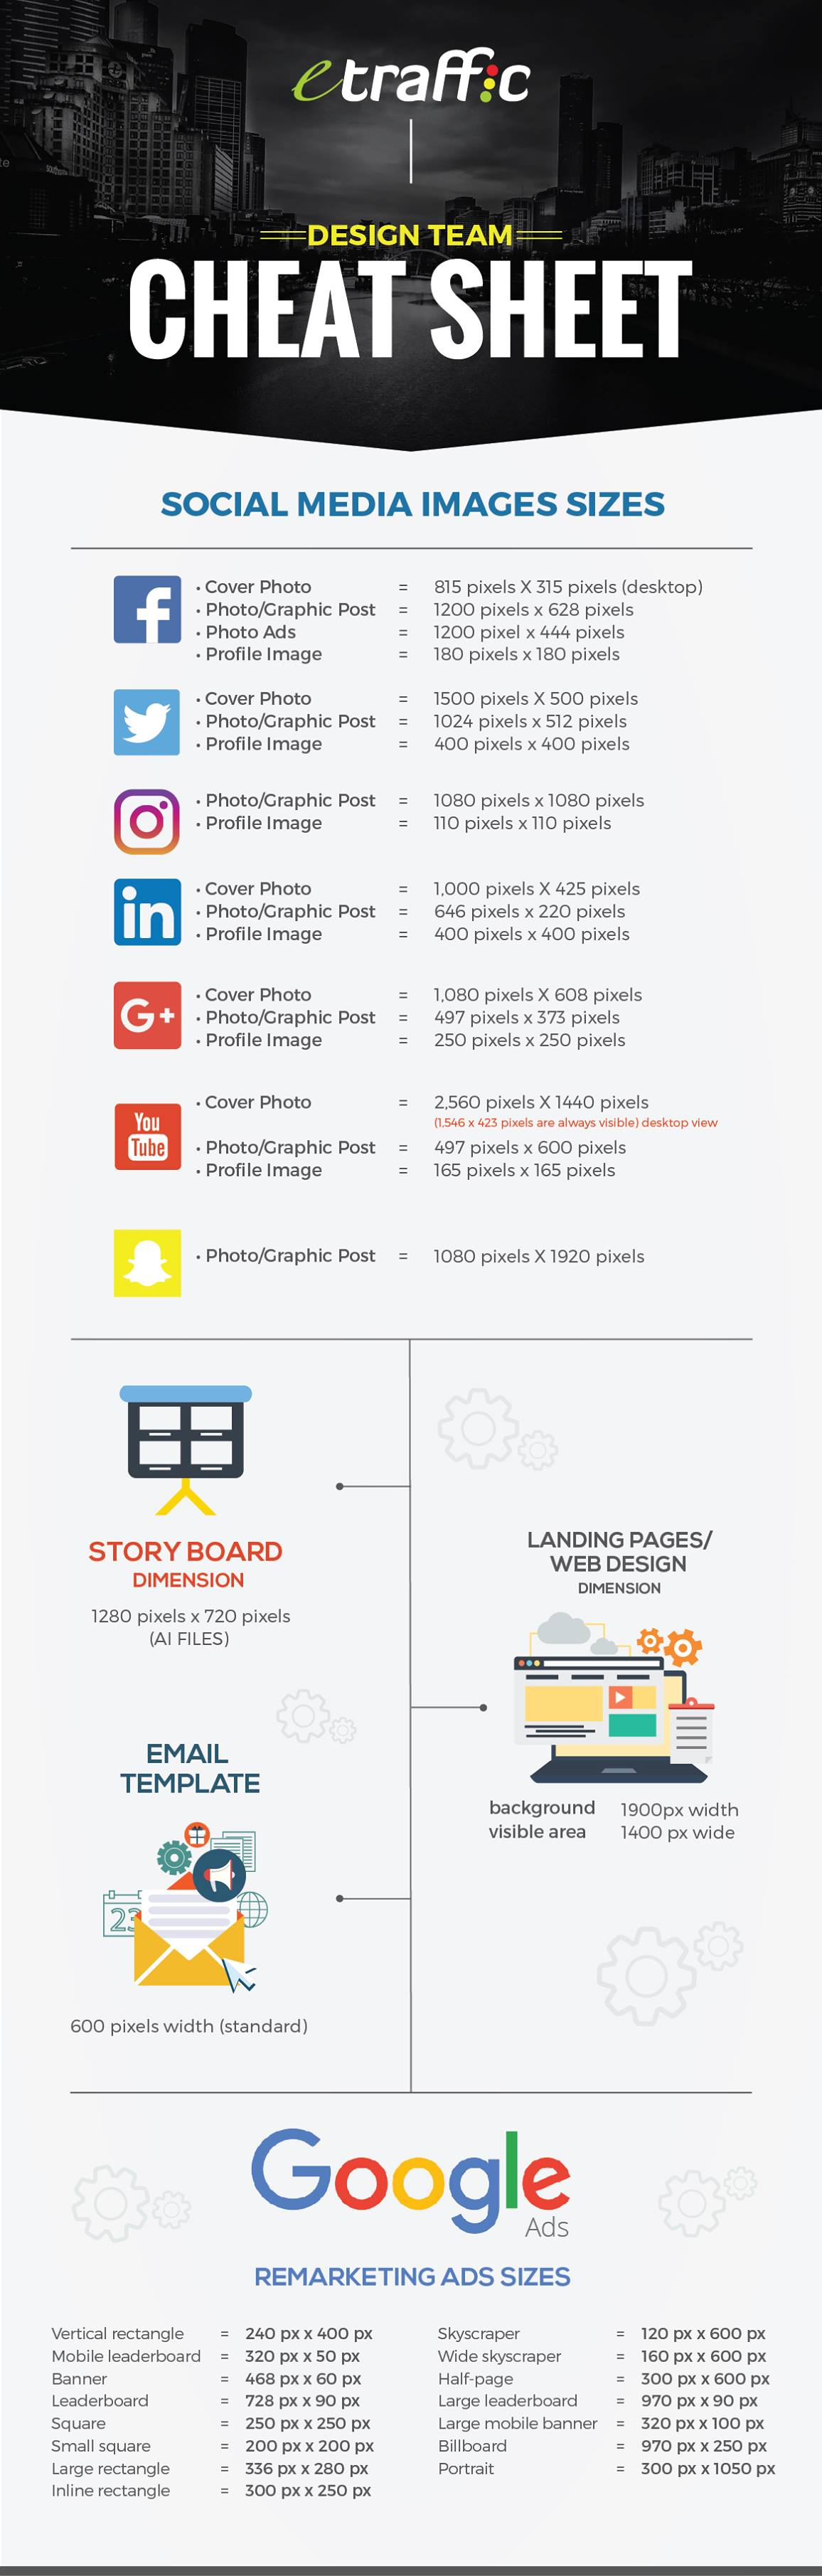 https://www.etraffic.com.au/infographics/social-media-image-size-dimensions/